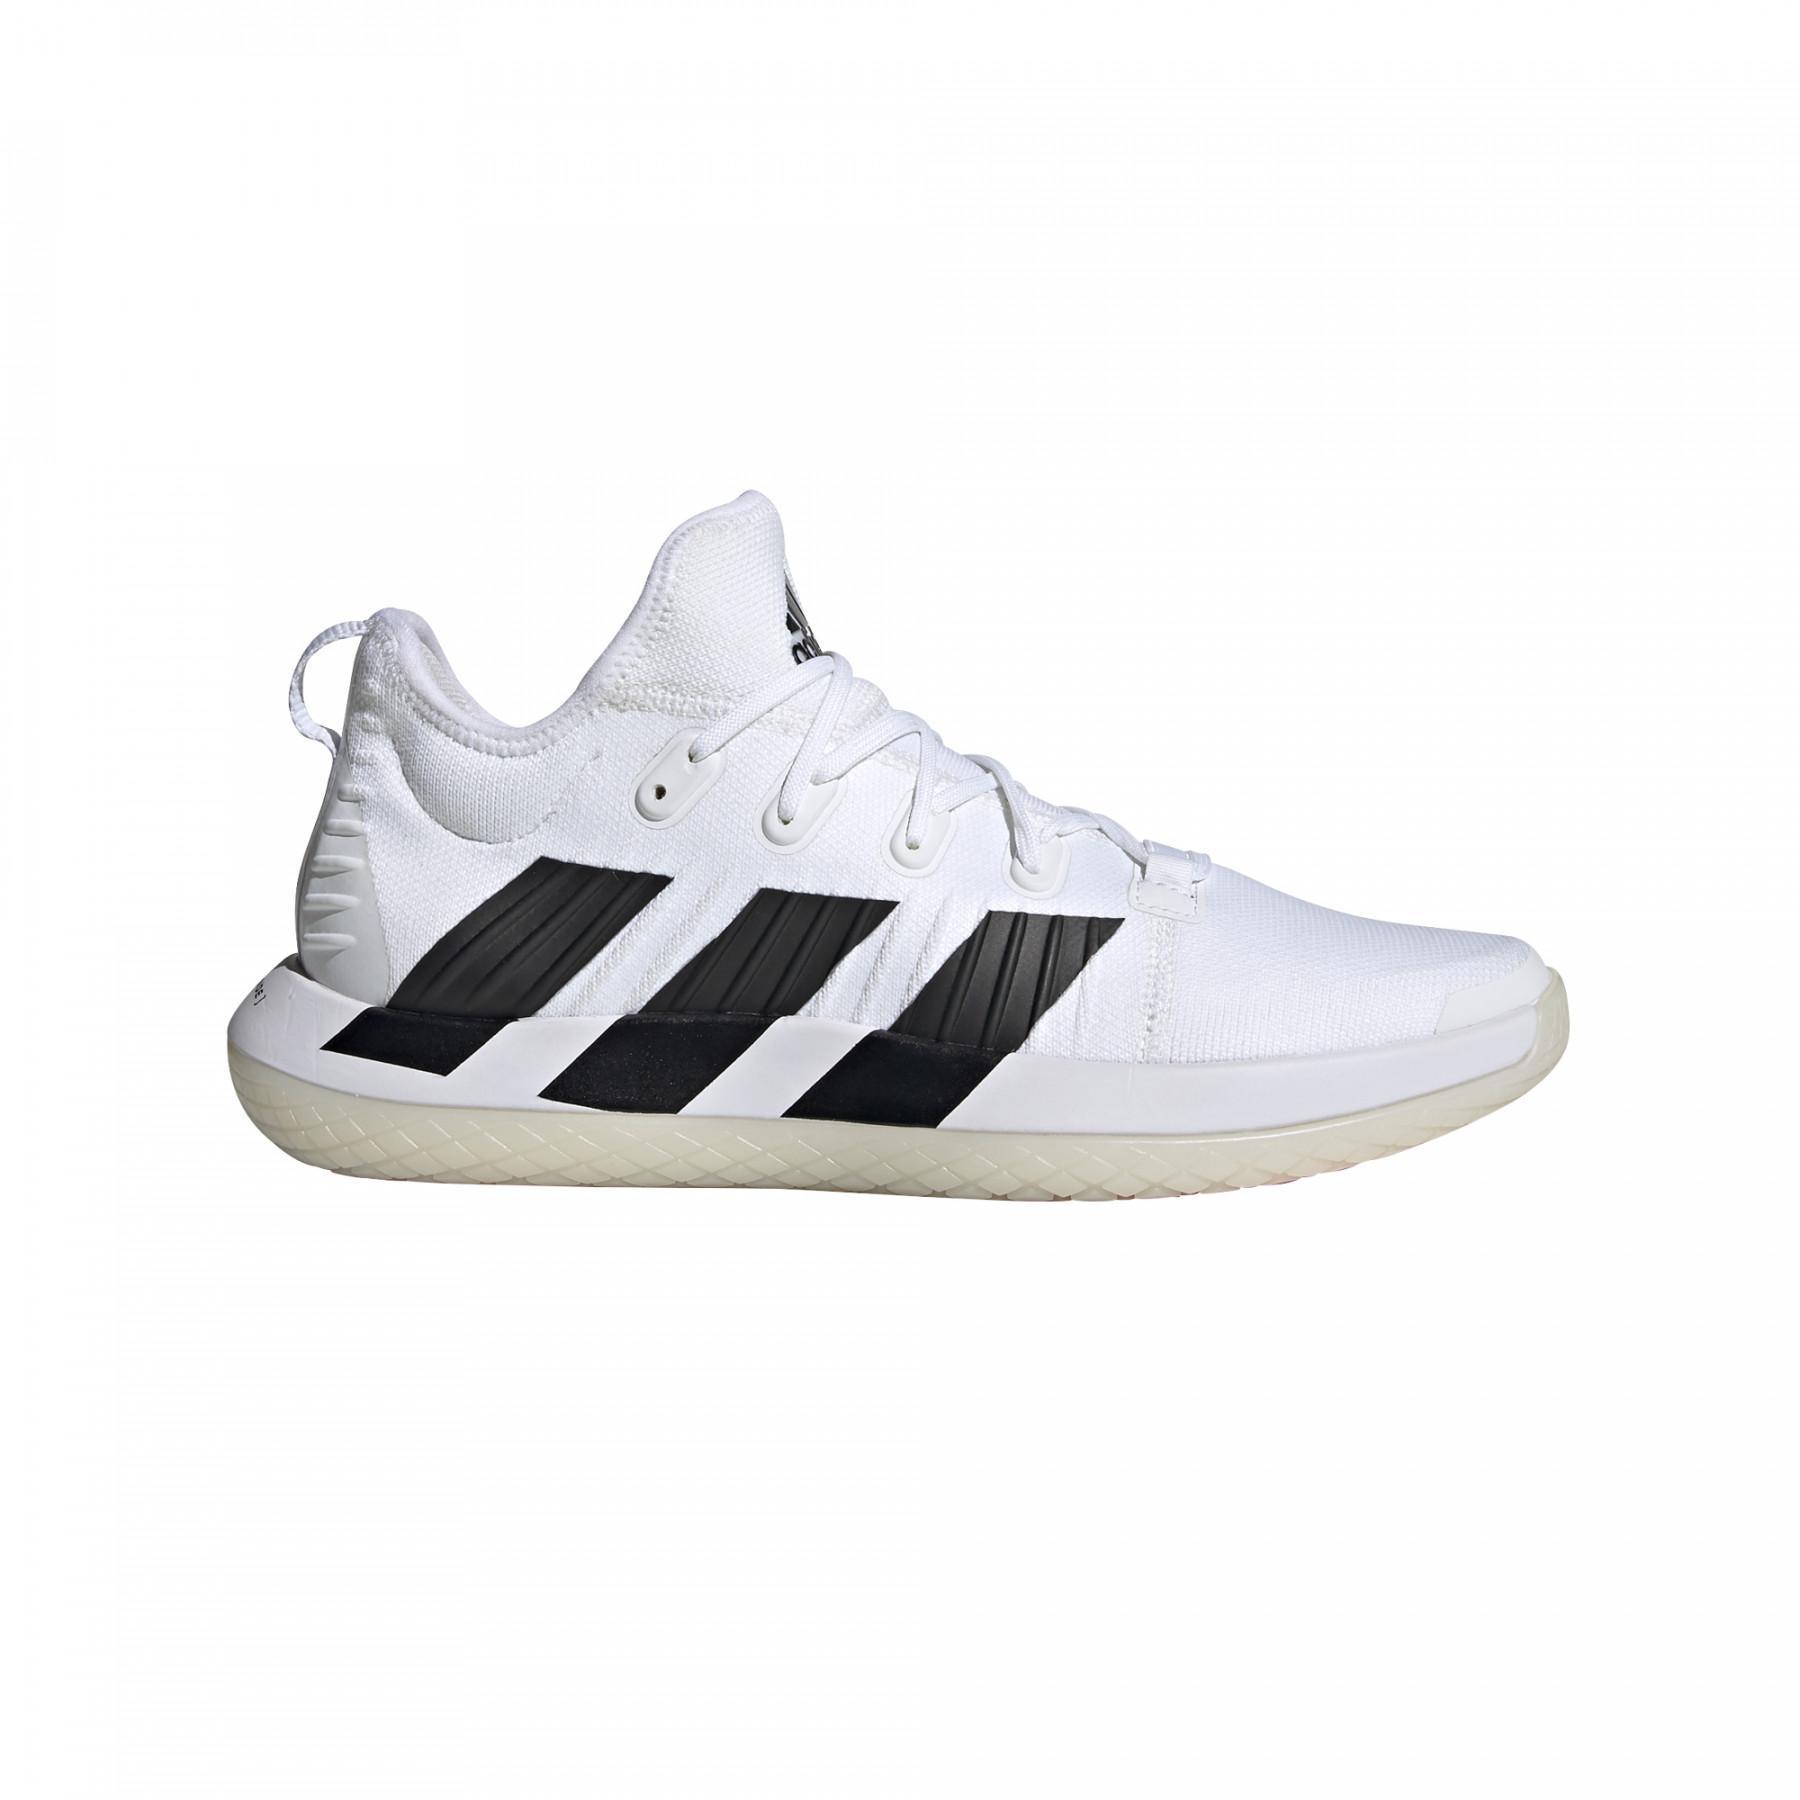 Shoes adidas Stabil Next Gen